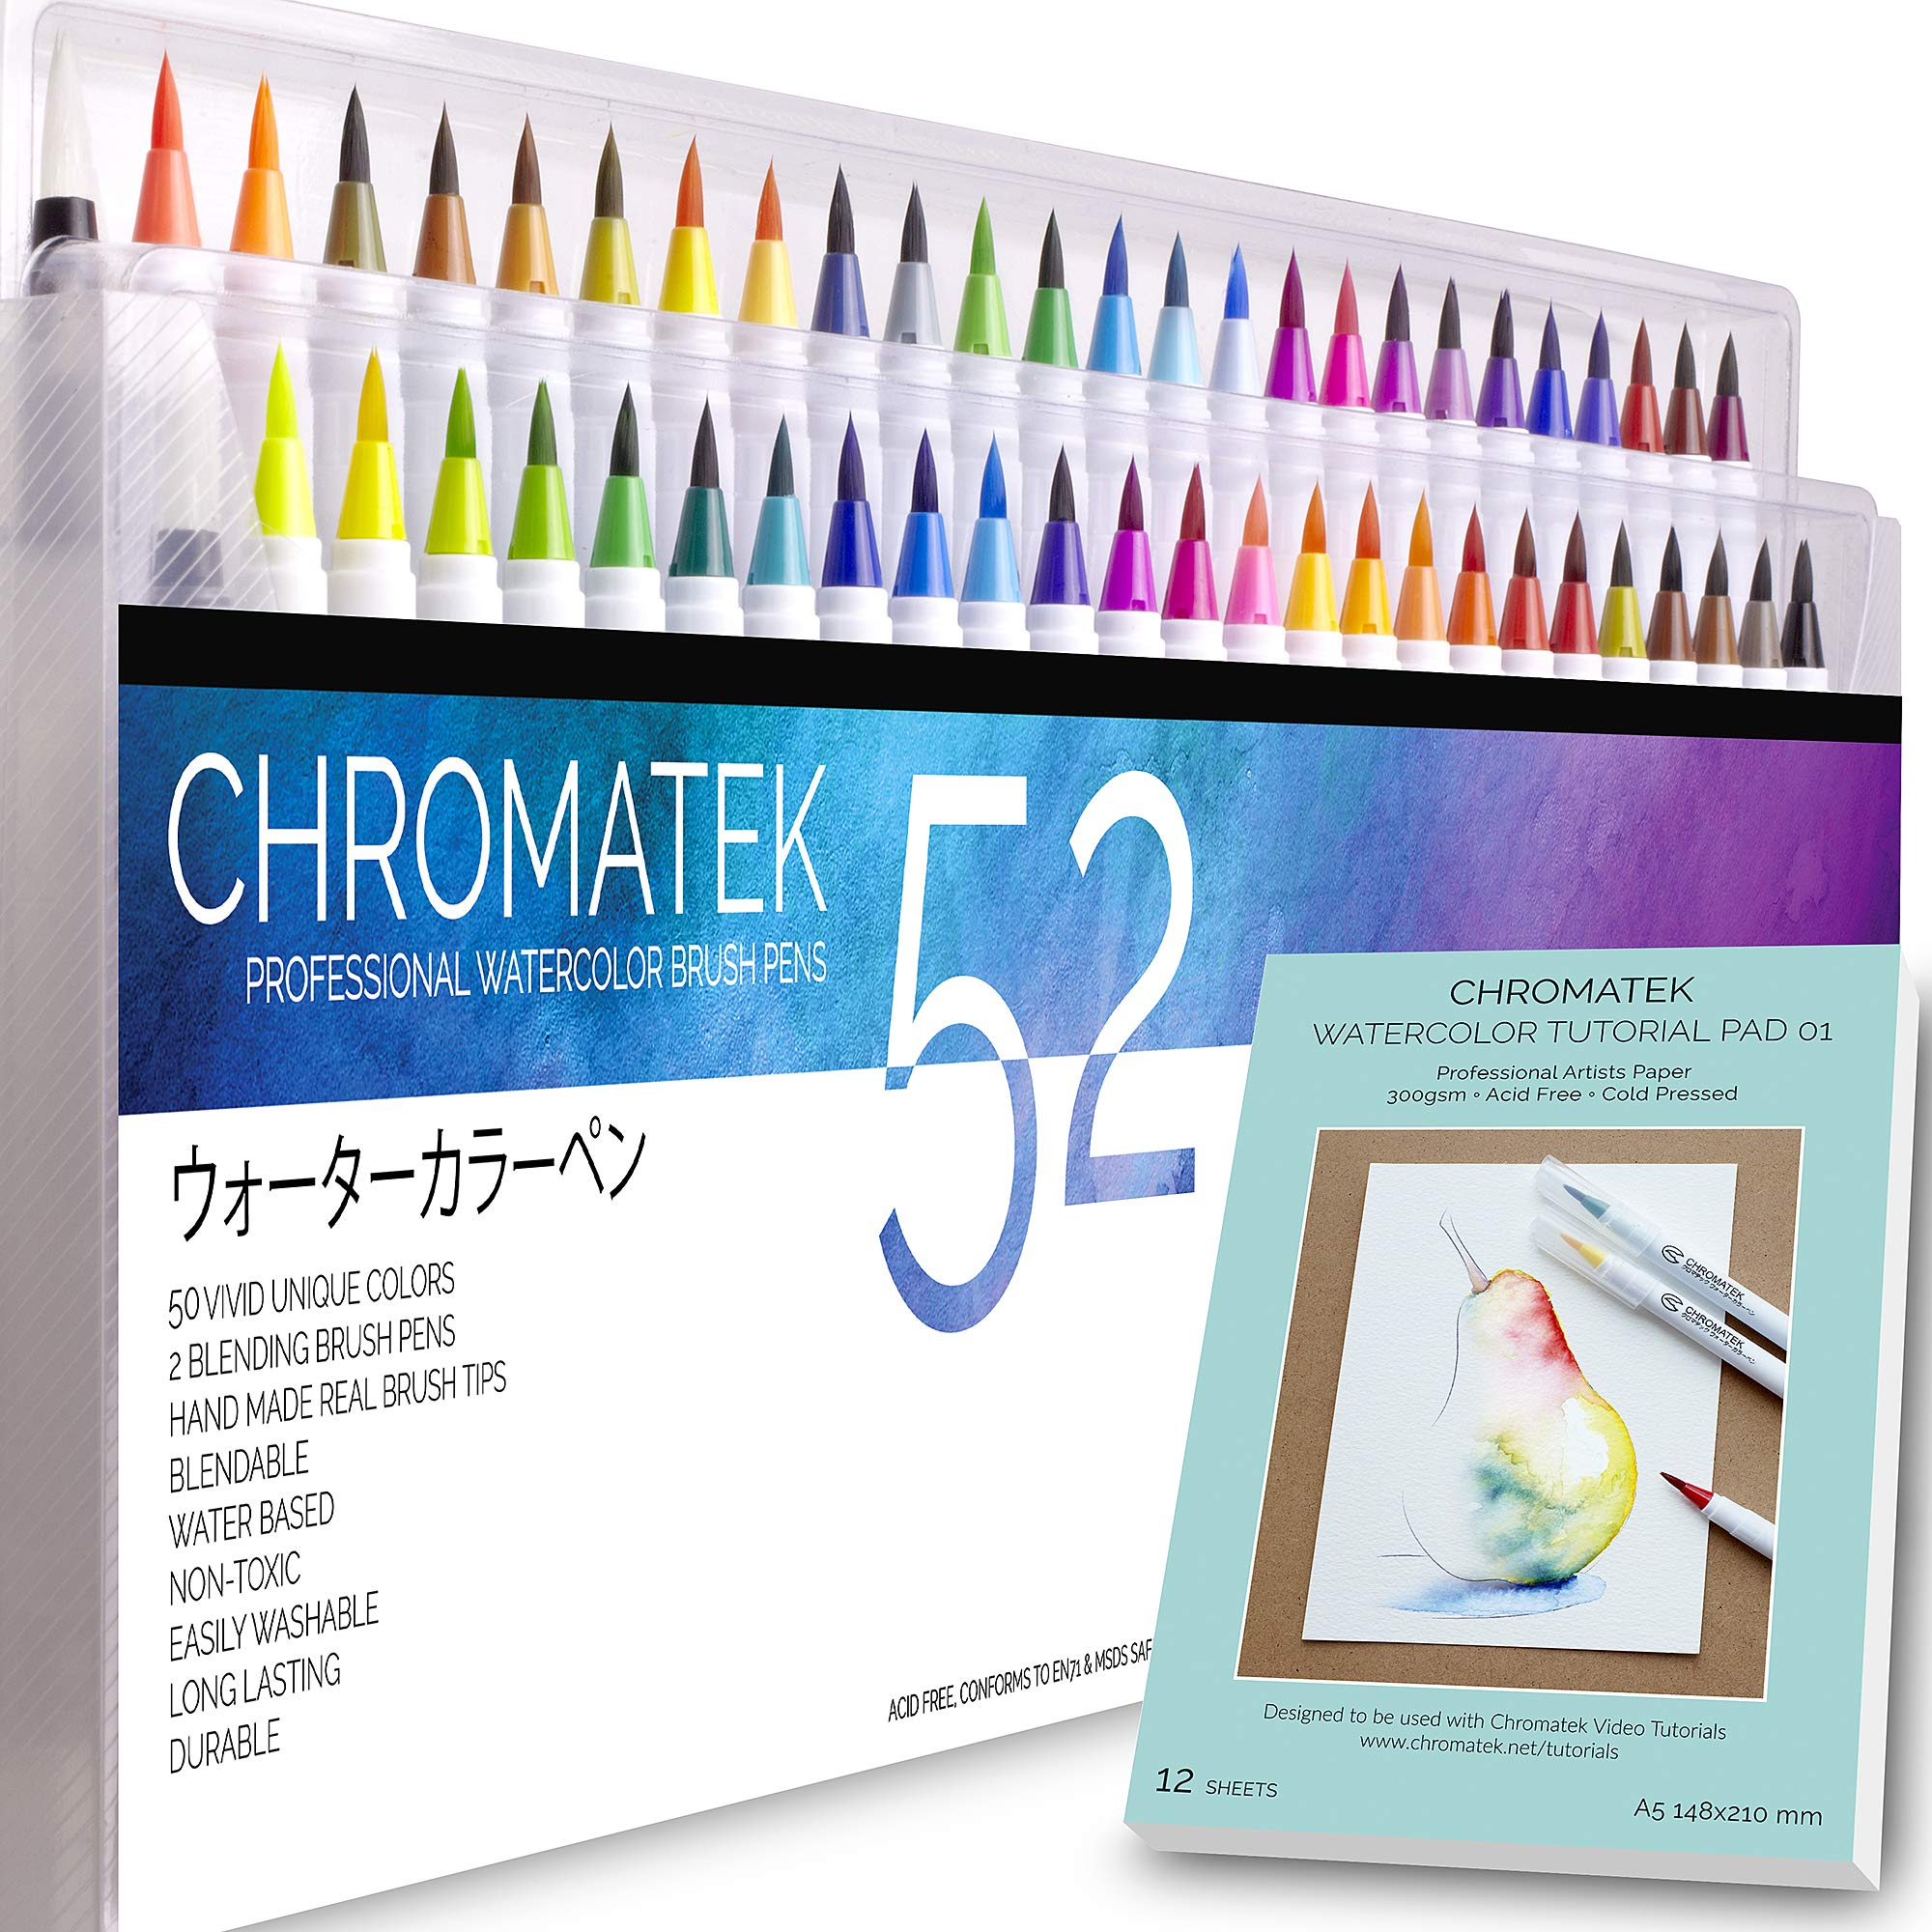 52 Watercolor Brush Pens, Tutorial Pad & Video Series by Chromatek. Real Brush Tip. Vivid. Smooth. Blendable. Long Lasting. Professional Artist Quality. 50 Colors 2 Blending Brushes.